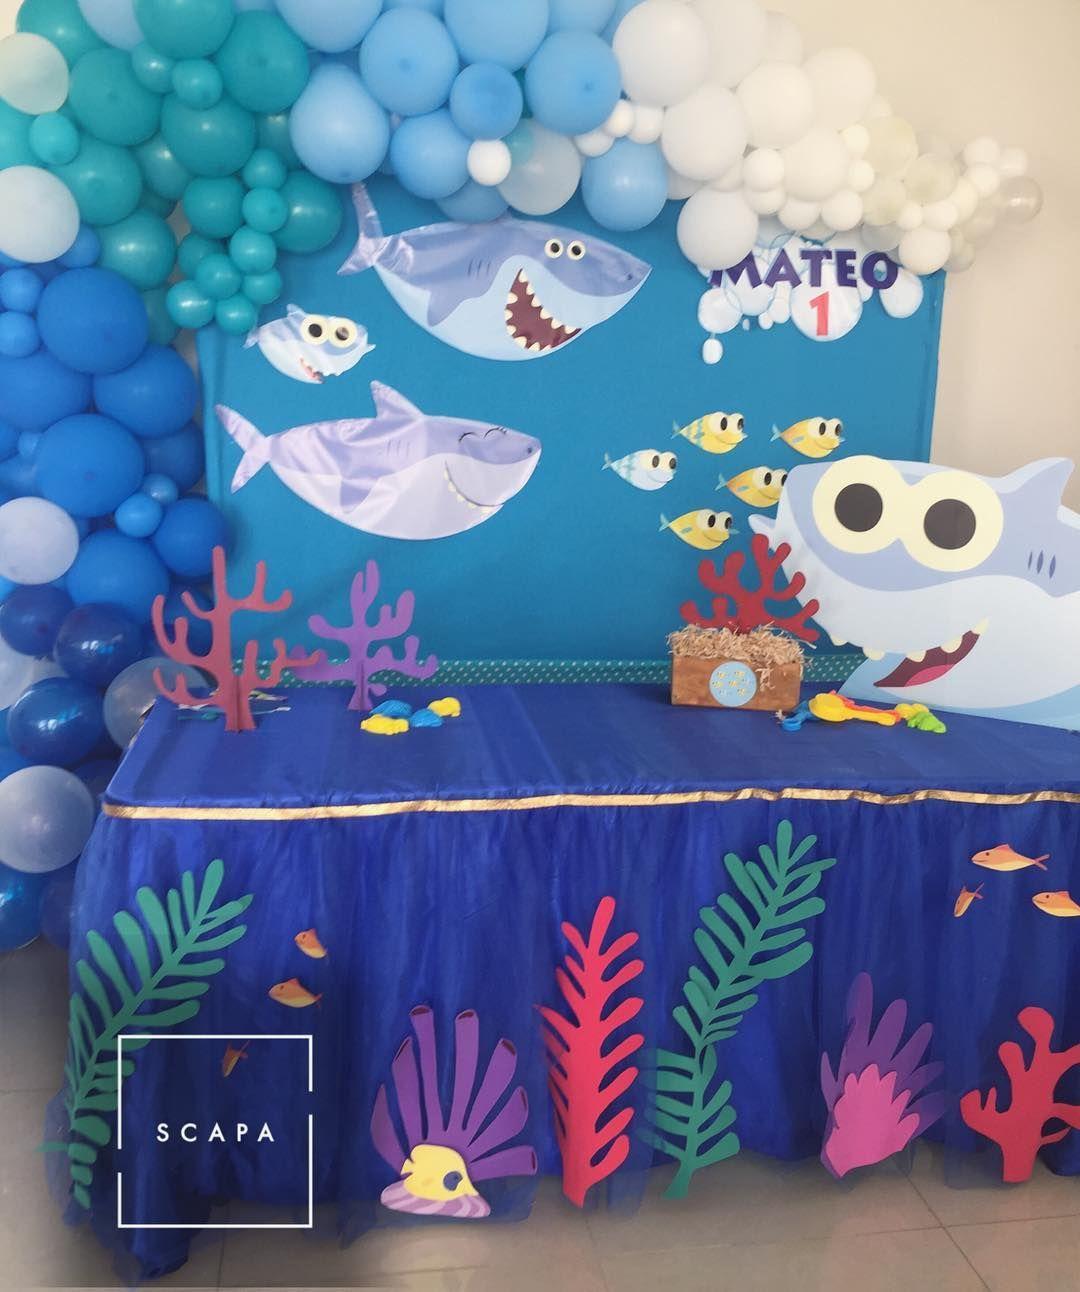 Baby Shark doo doo doo 🎶🦈🎶 scapa scapaeventos candybar